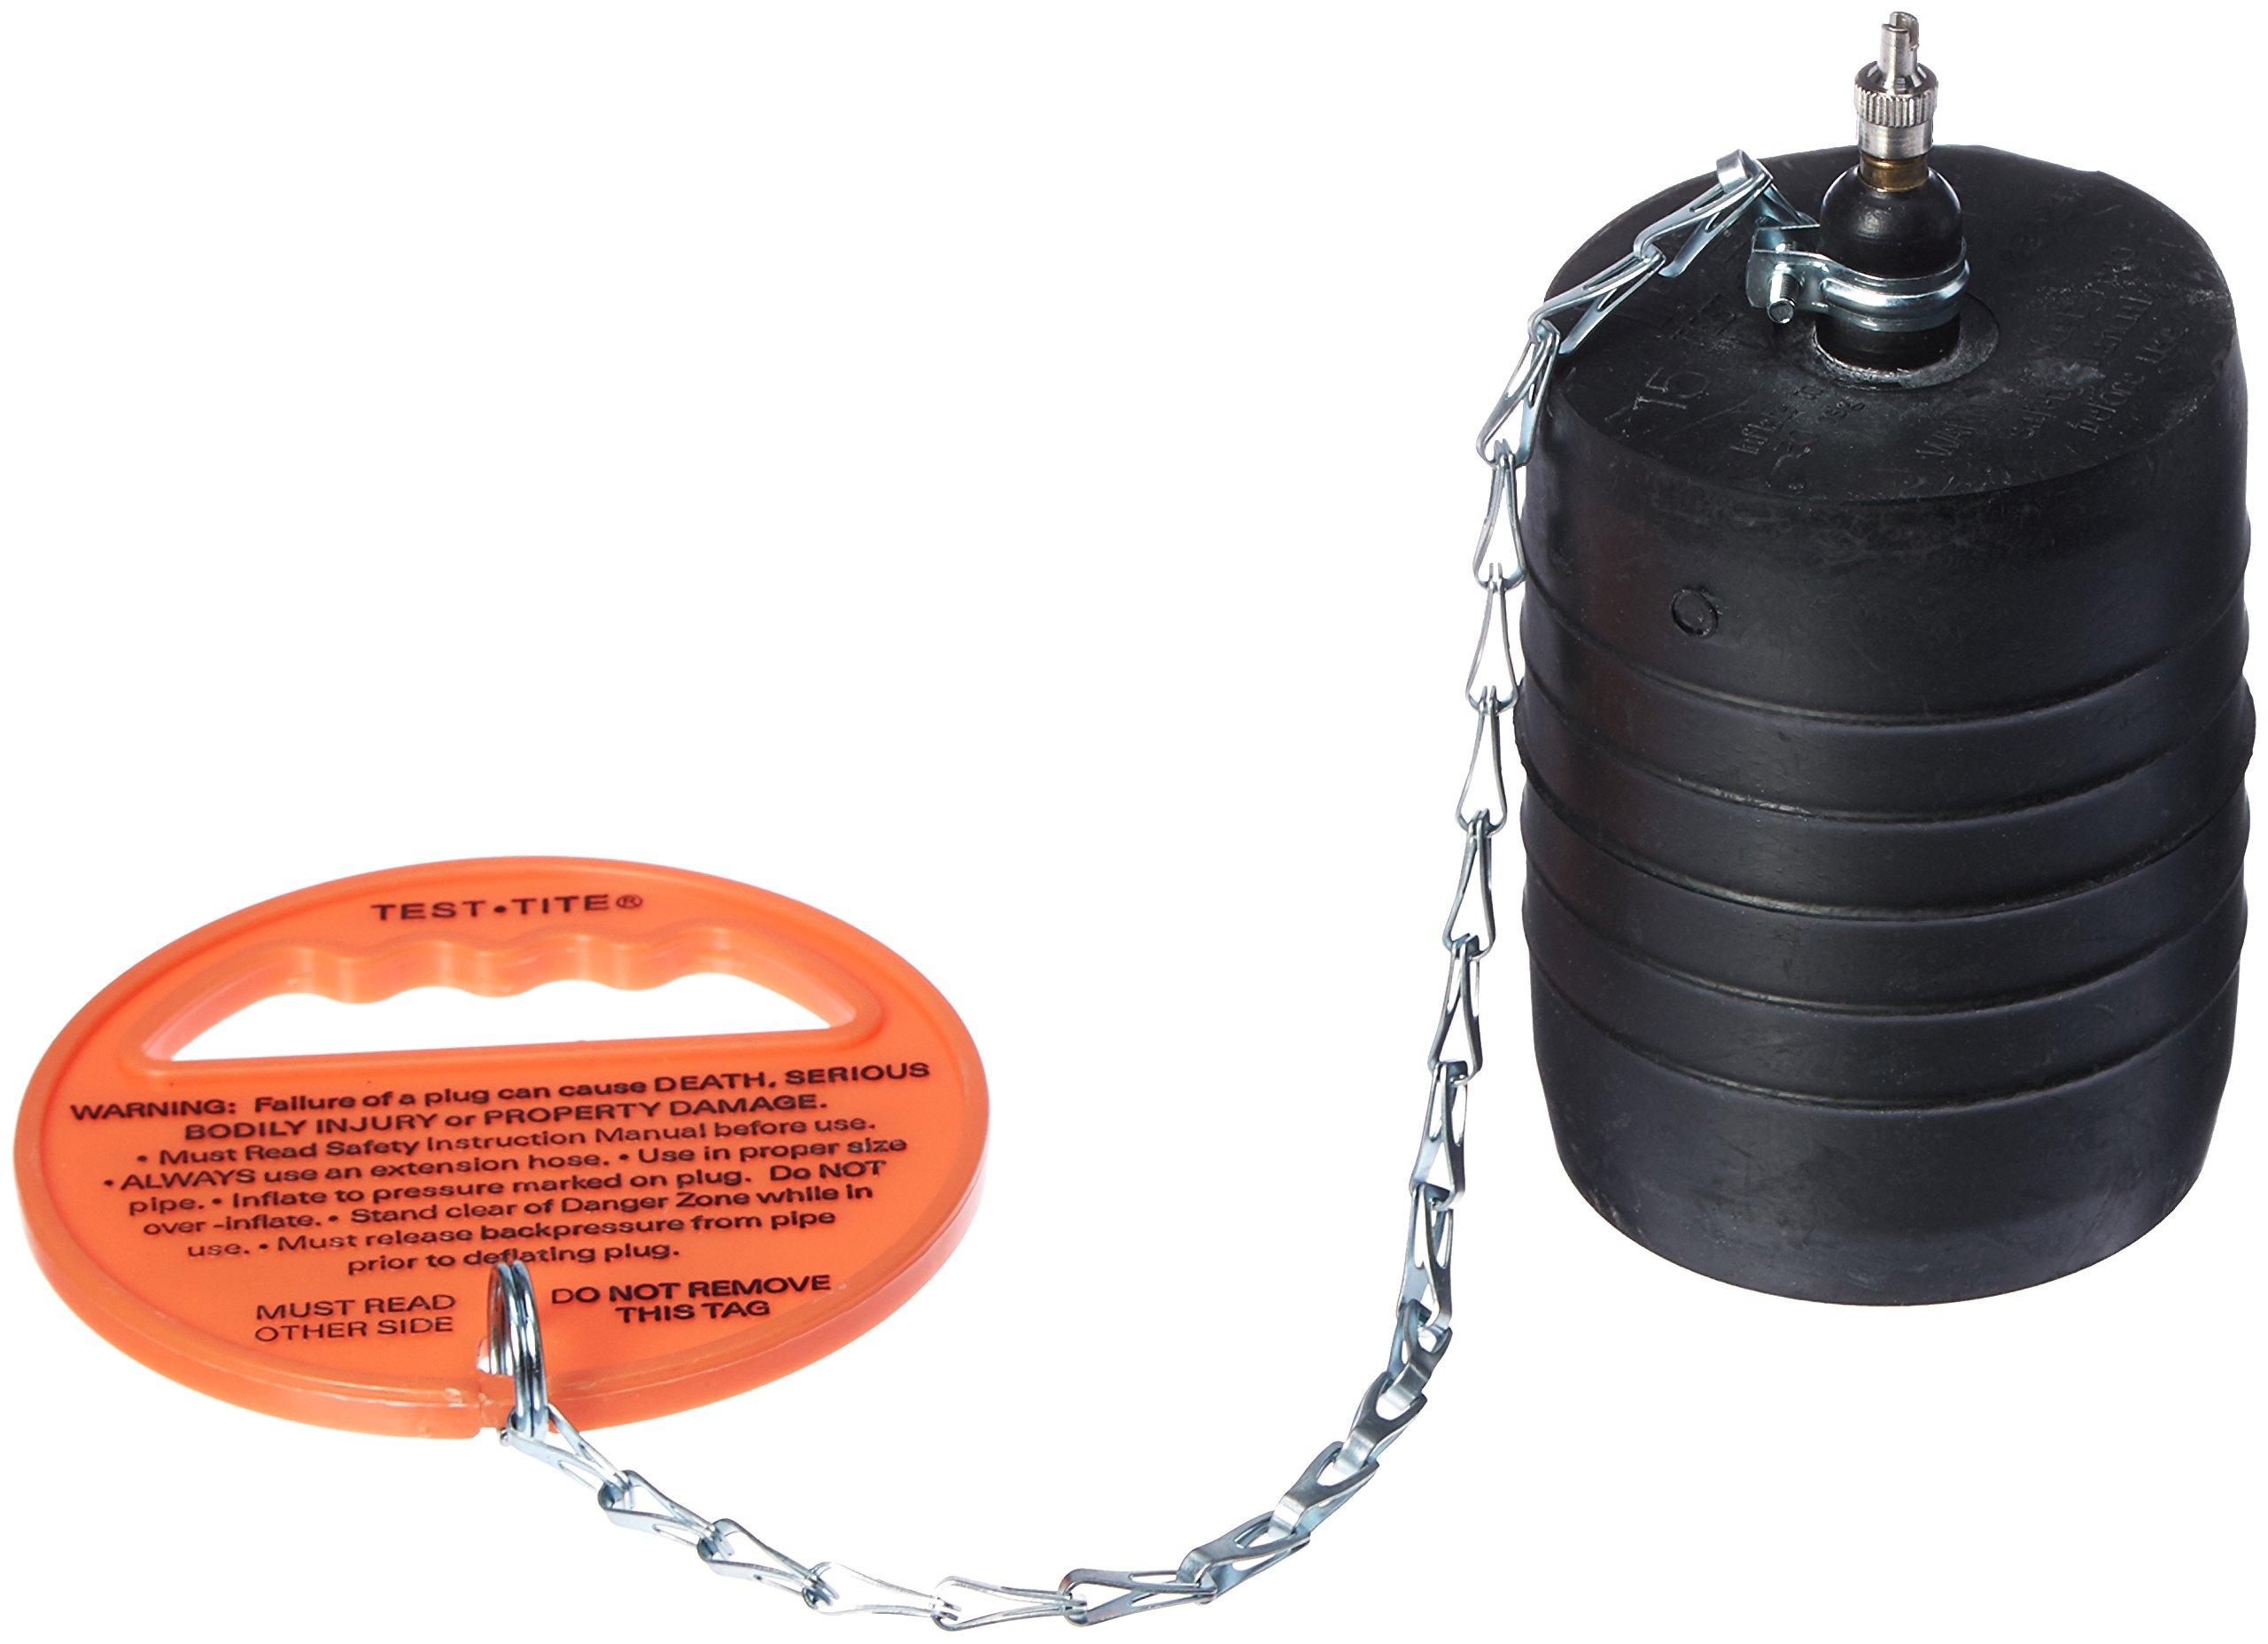 IPS 83614 4-Inch Standard Pneumatic Test Plug